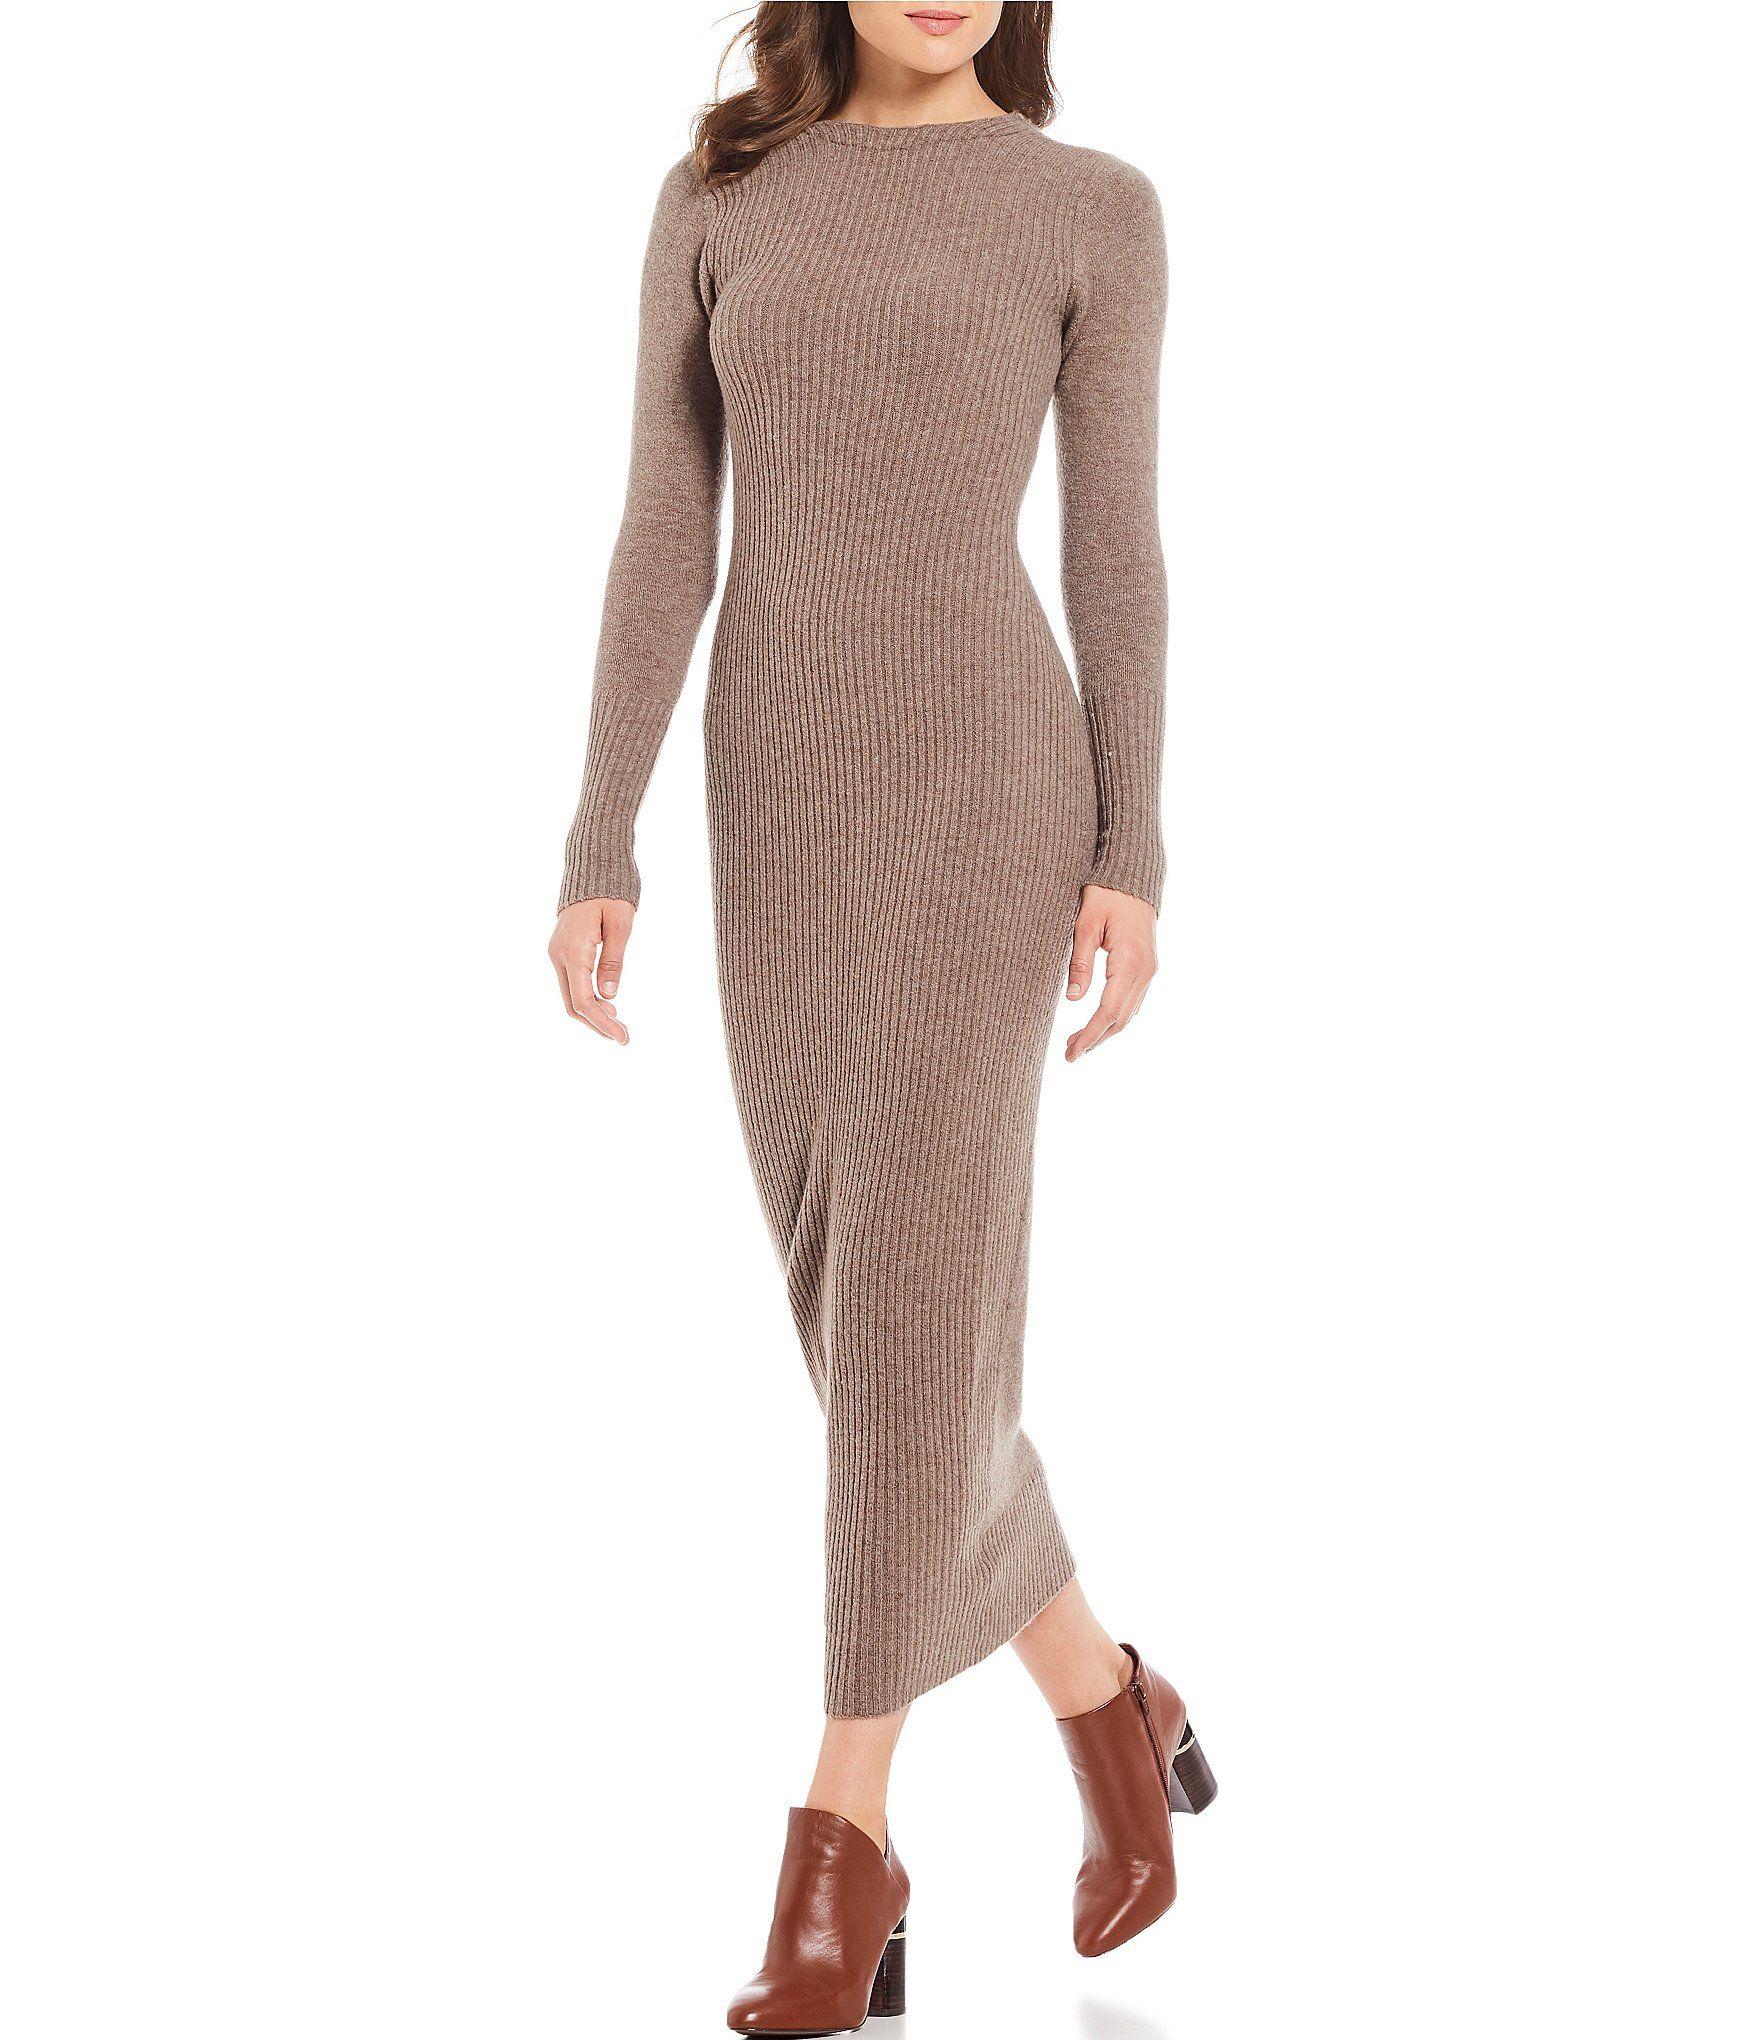 c8e63331b8f Shop for Antonio Melani Sierra Ribbed Sweater V-Back Midi Dress at  Dillards.com. Visit Dillards.com to find clothing